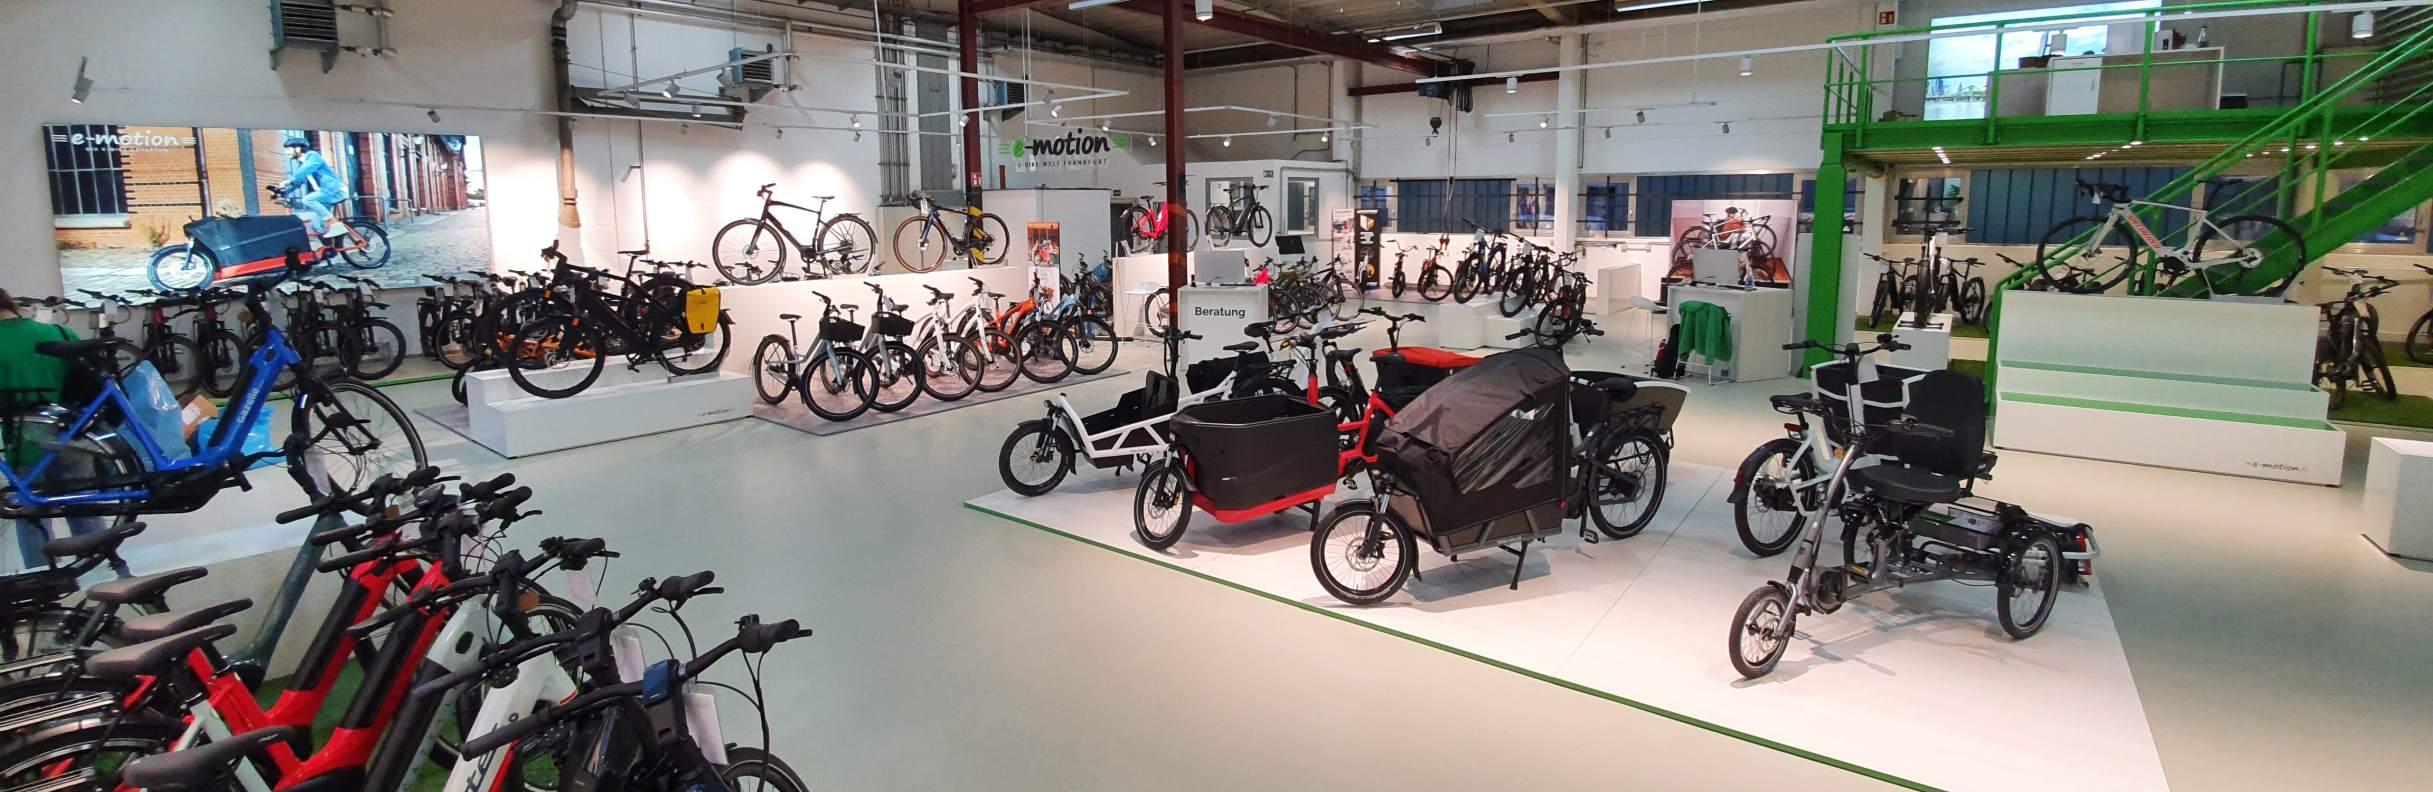 e-motion e-Bike Welt Frankfurt Nord